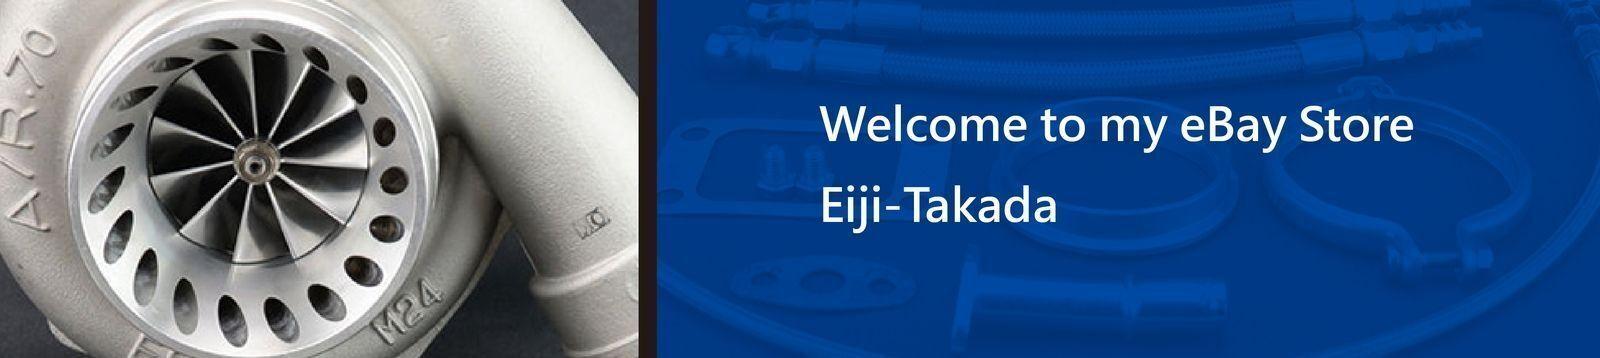 Eiji-Takada